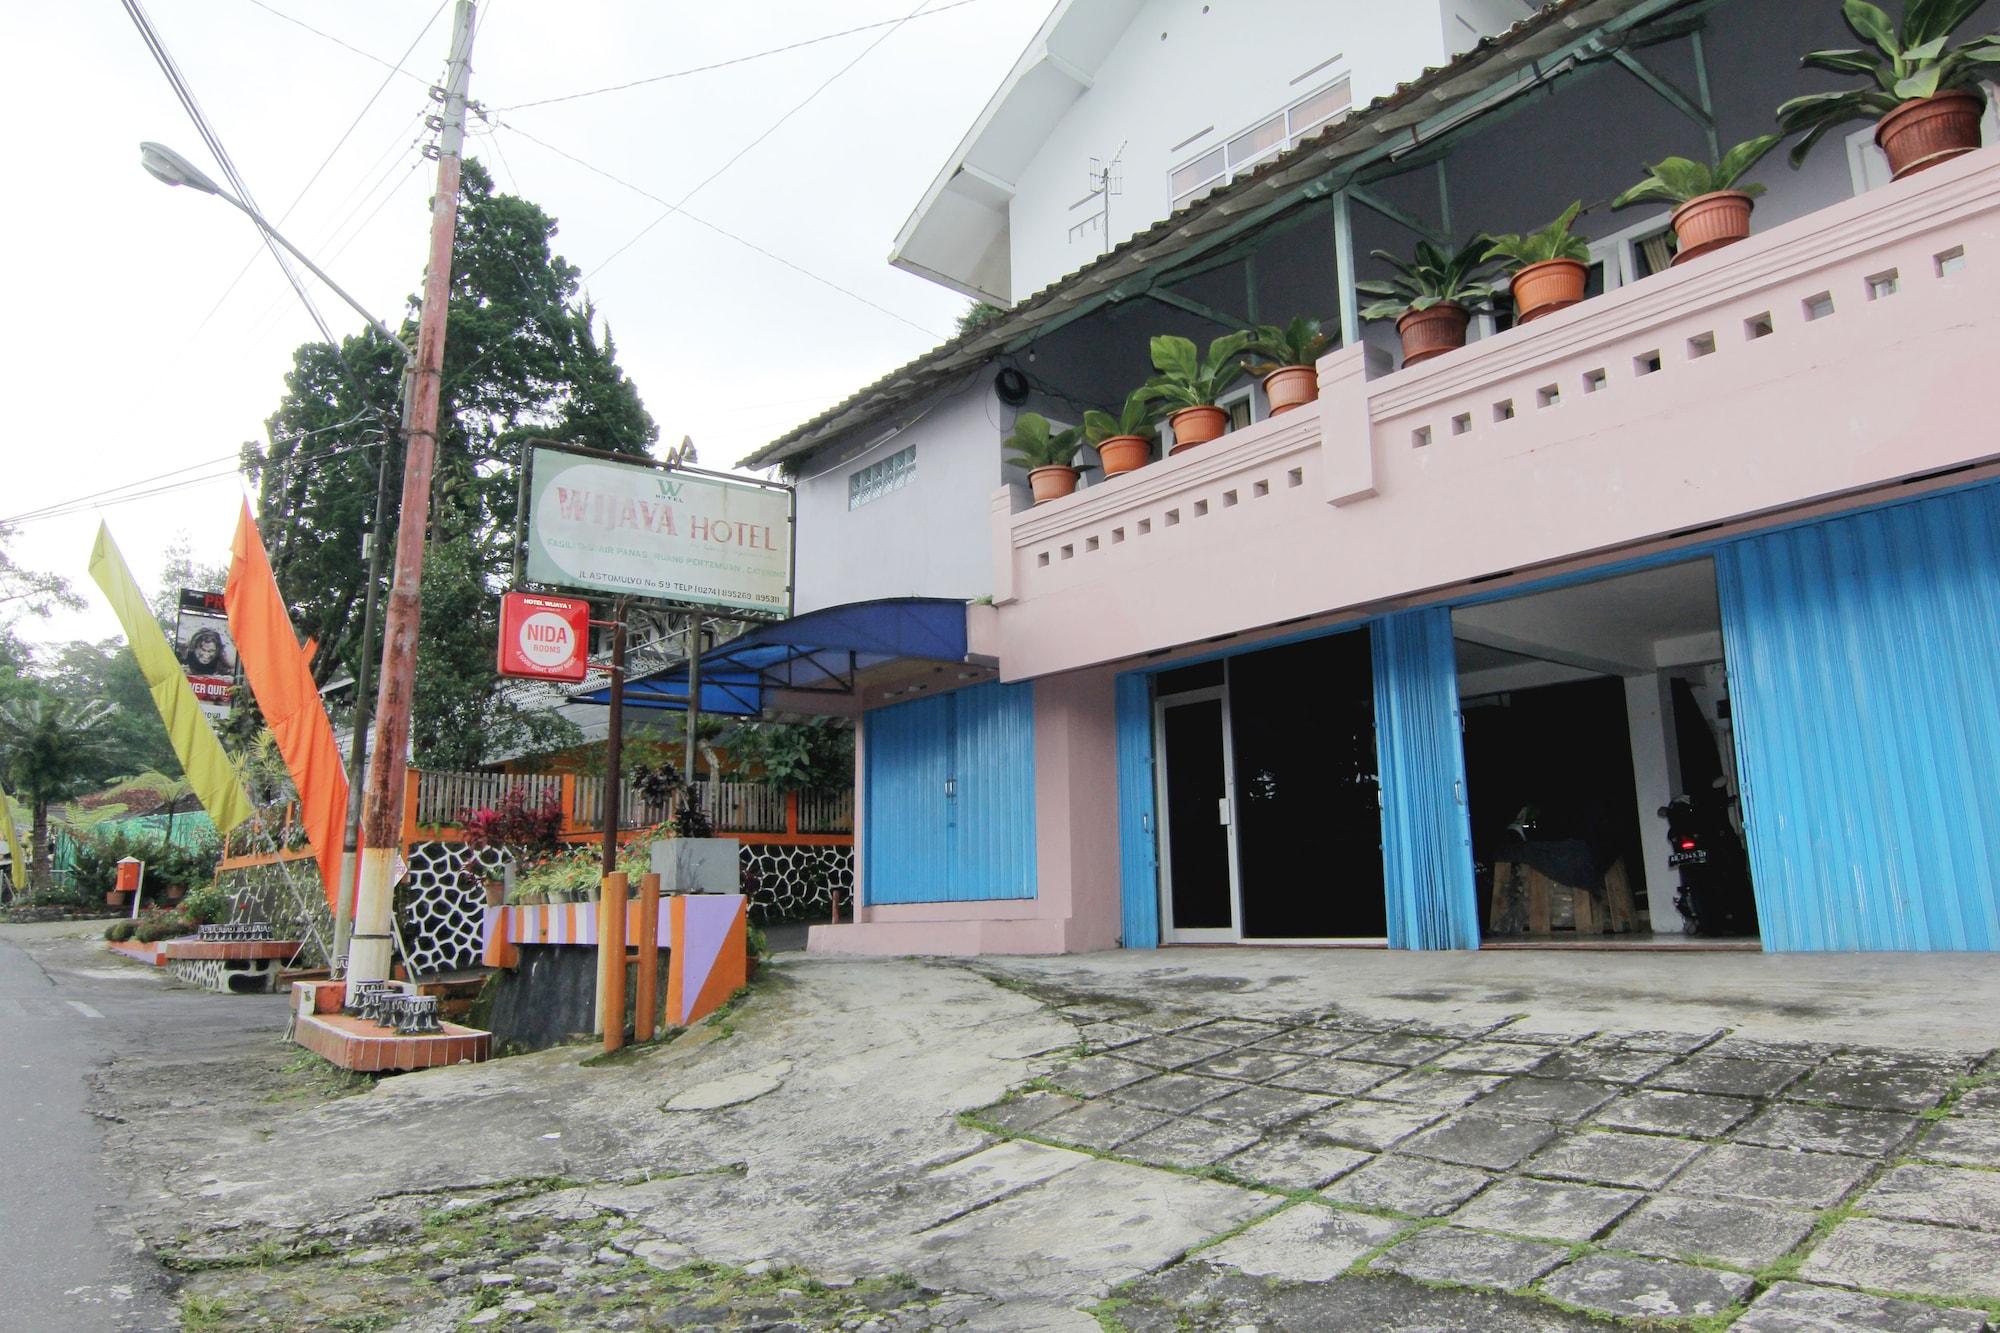 Hotel Wijaya 1 Kaliurang, Sleman